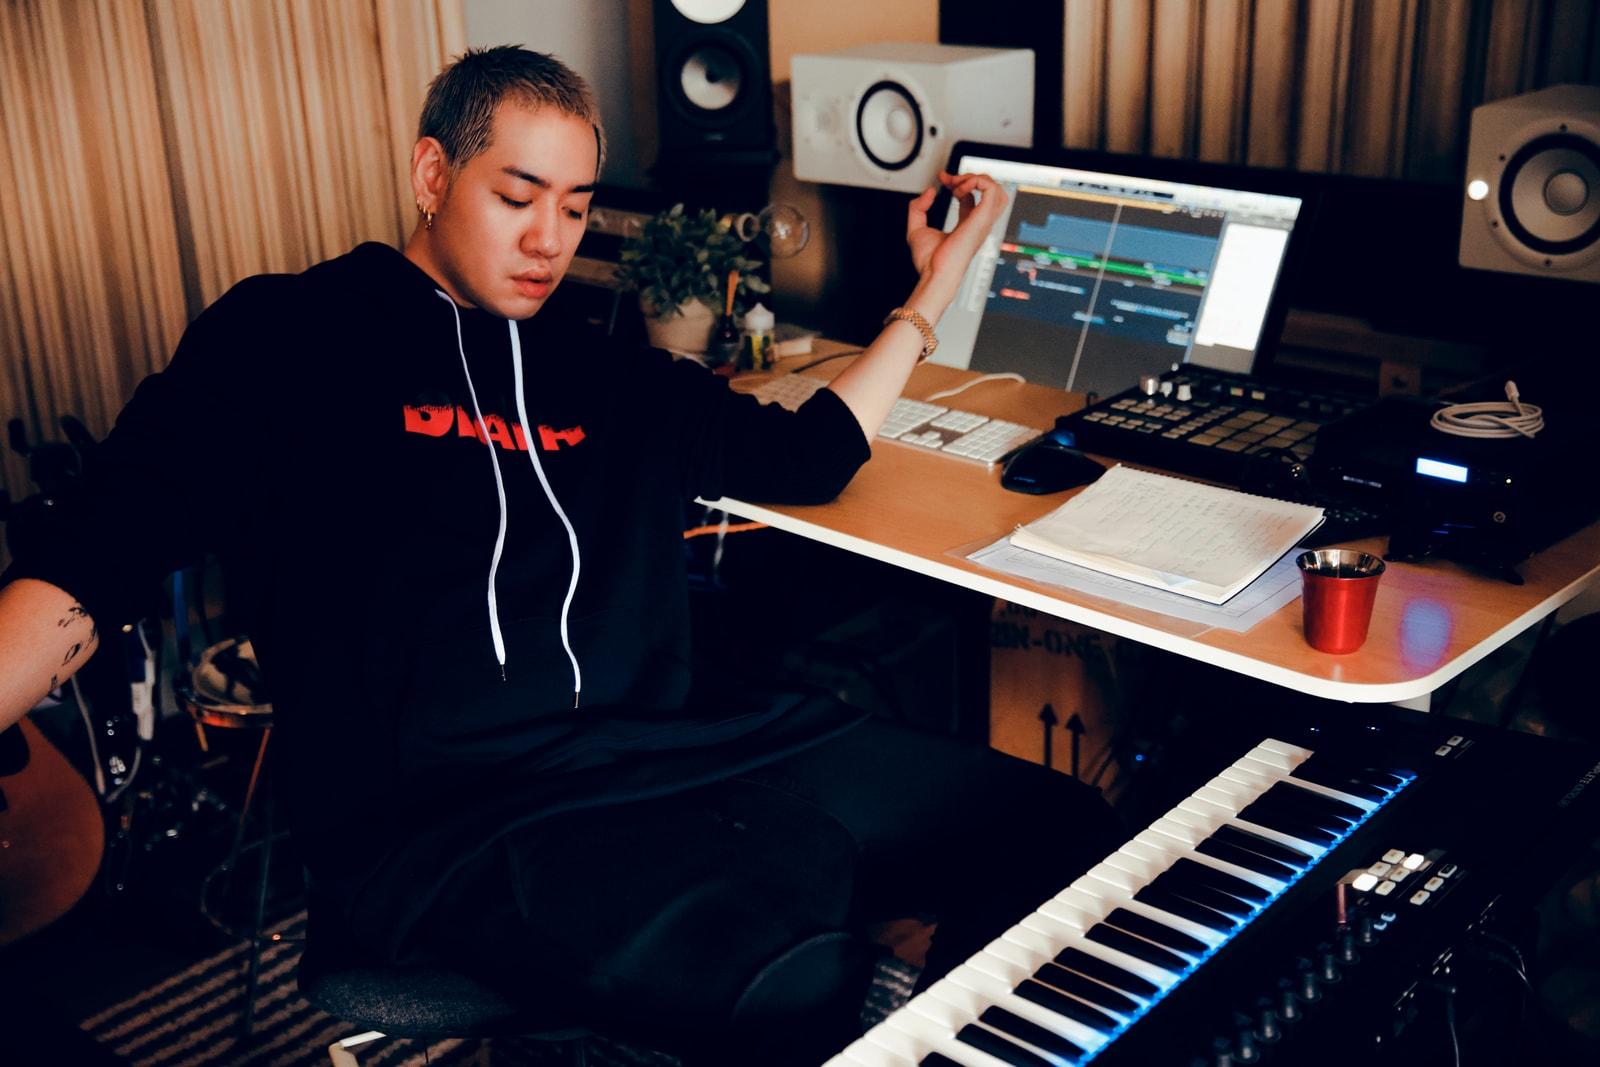 #HBPlaylist 與 Starr Chen & 9m88 共同打造 Nespresso「晨間歌單」